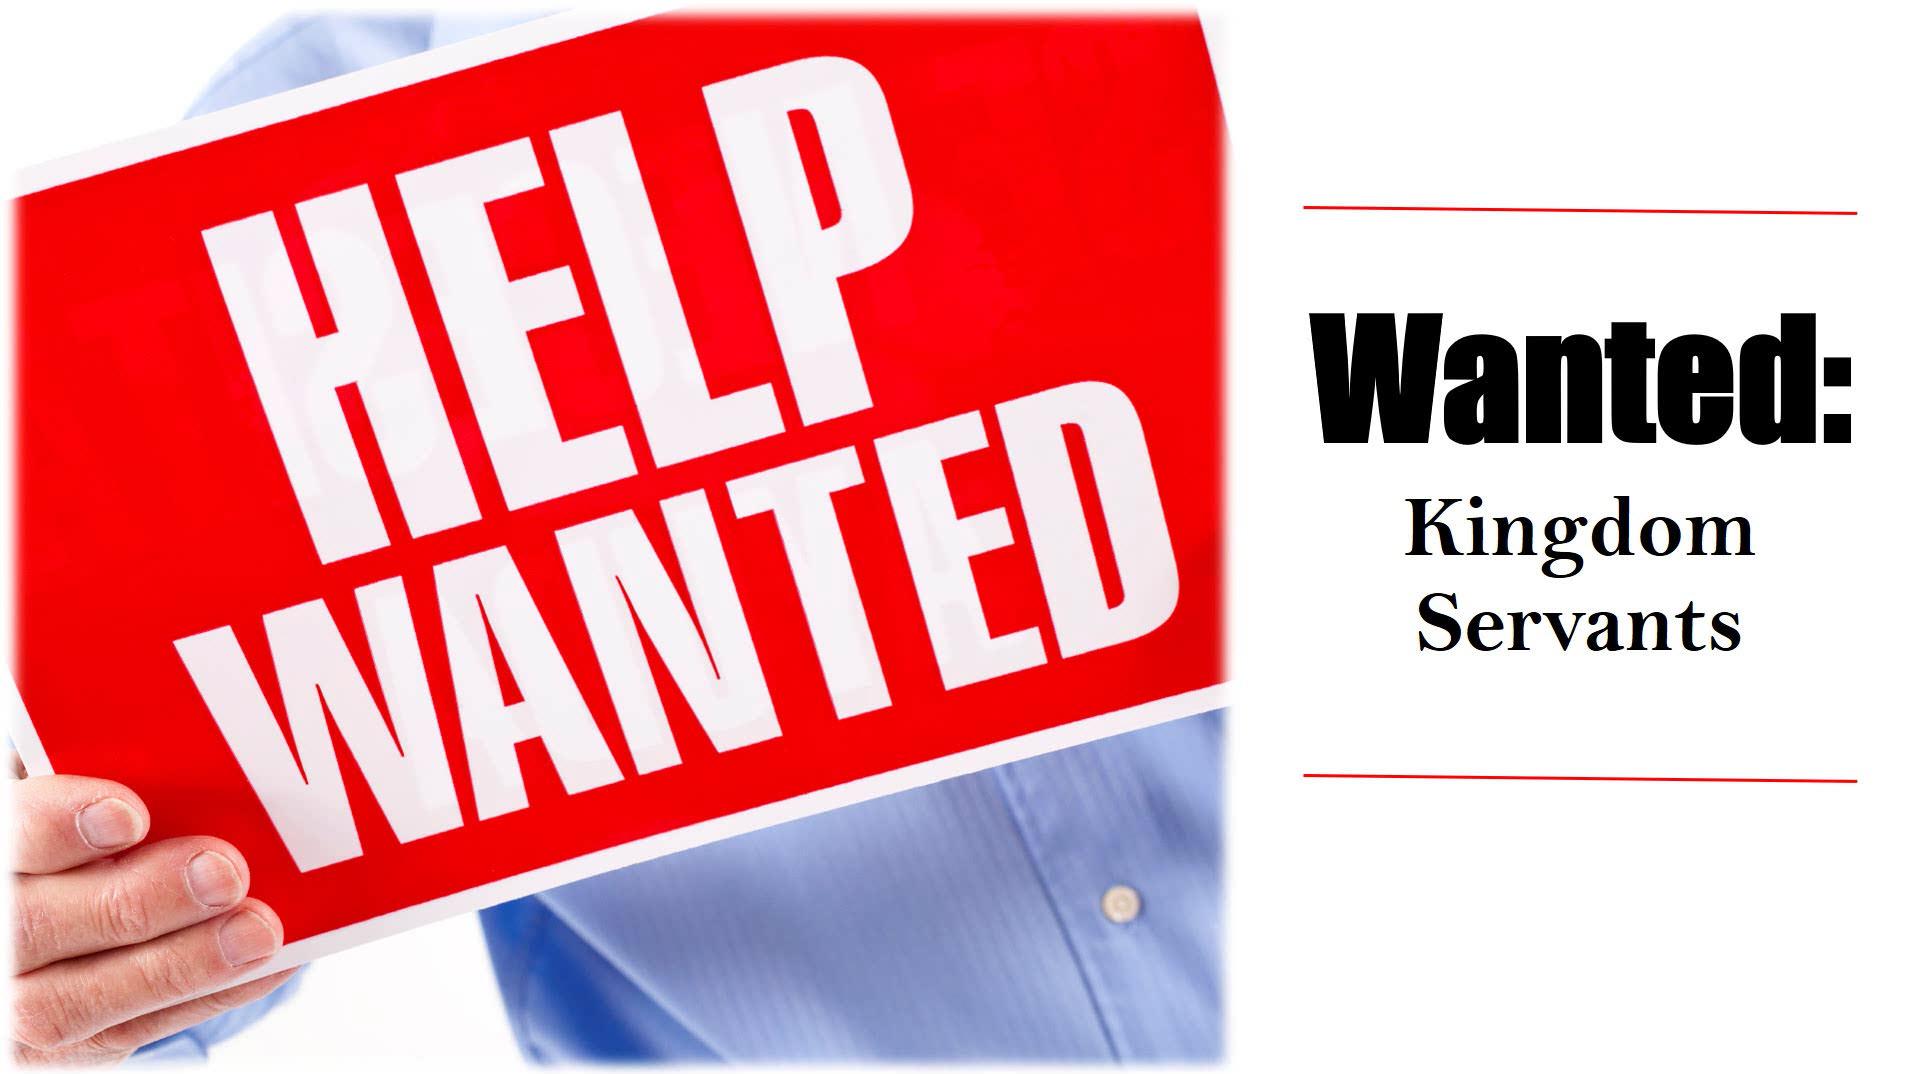 Wanted: Kingdom Servants